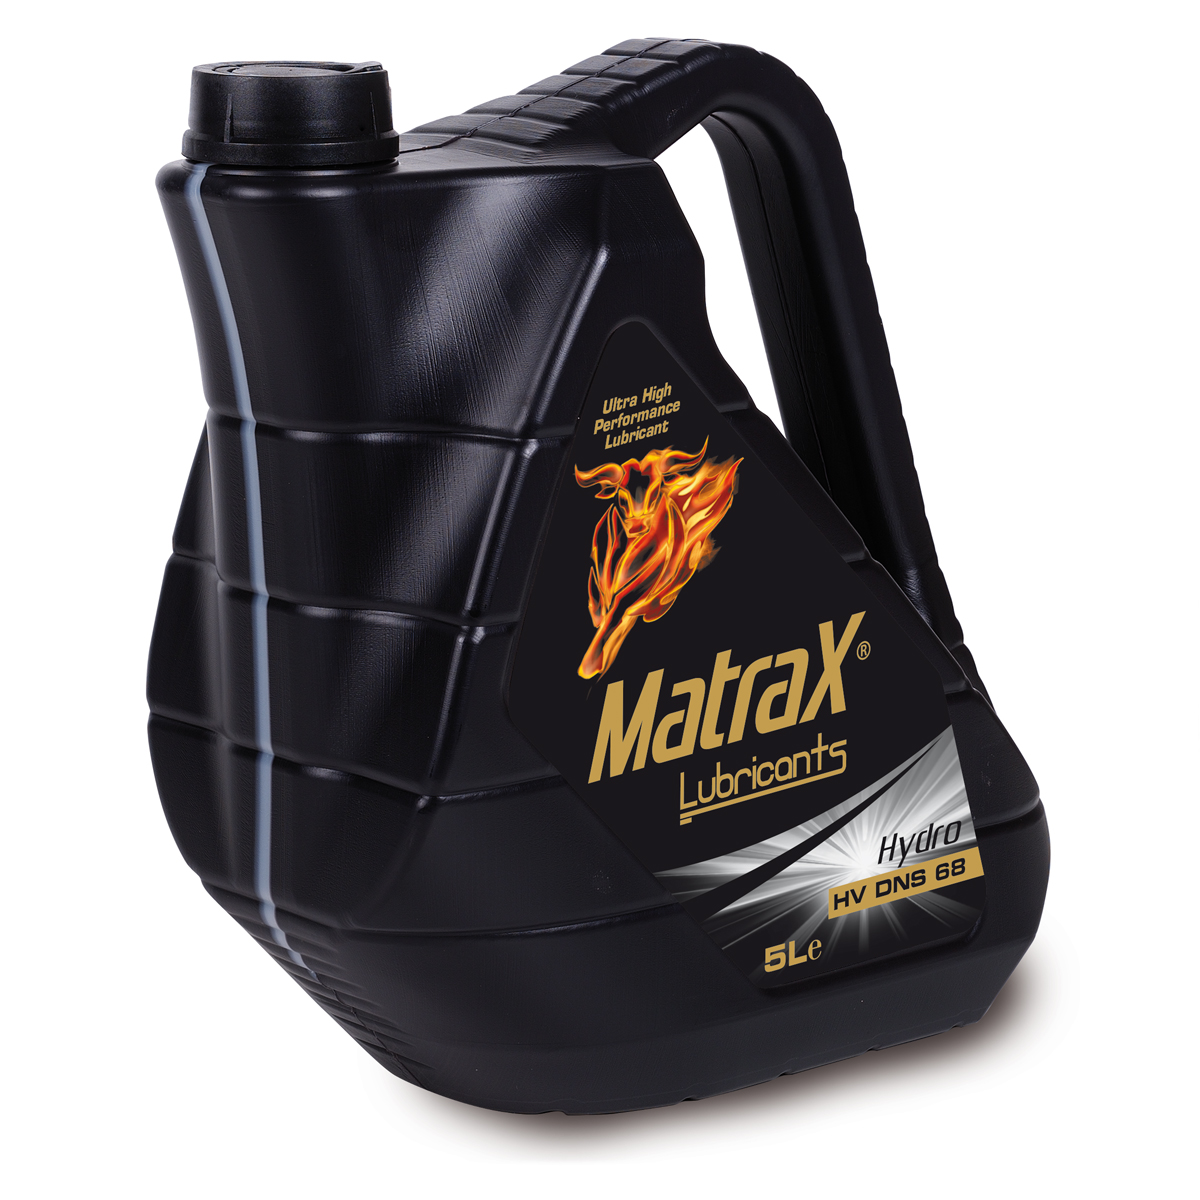 matrax-lubricants-hydro-hv-dns-68-5l